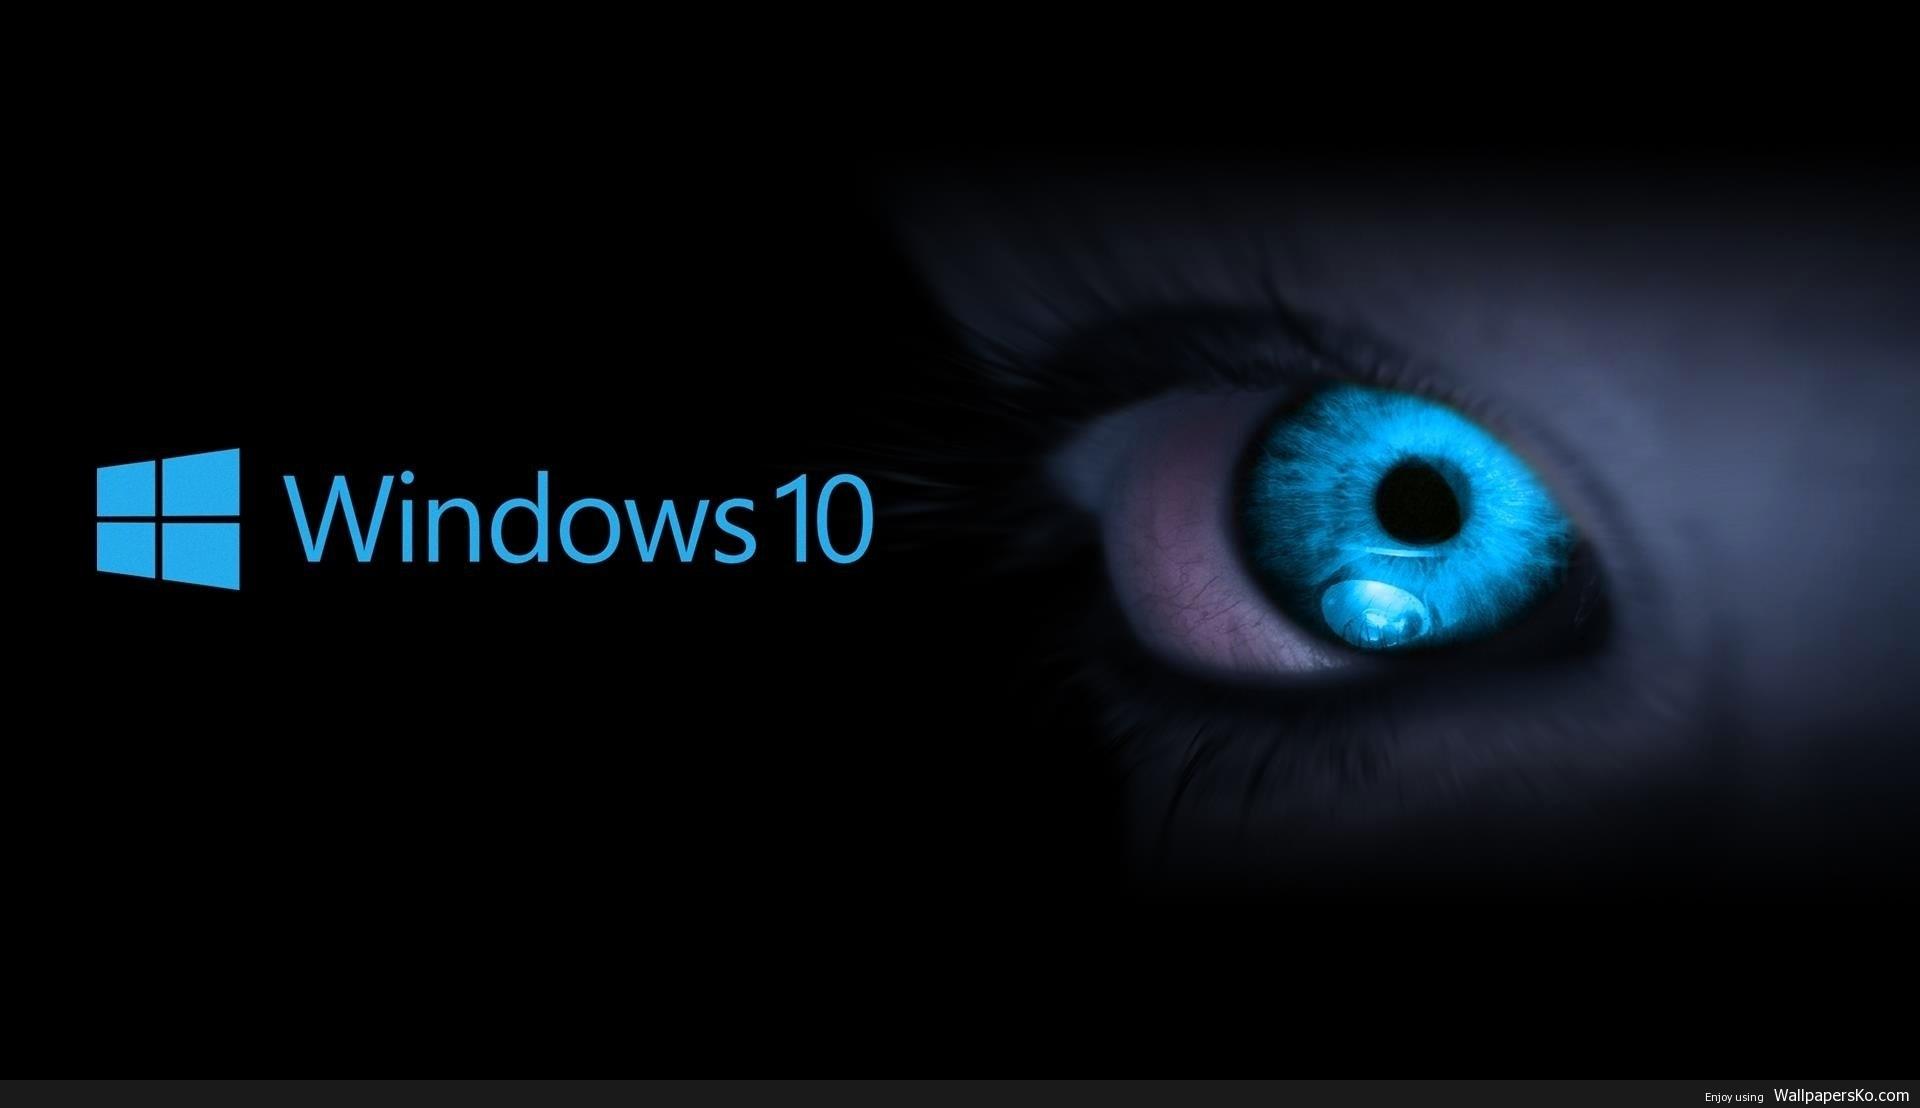 Windows 10 Wallpapers Hd Hd Wallpapers Download